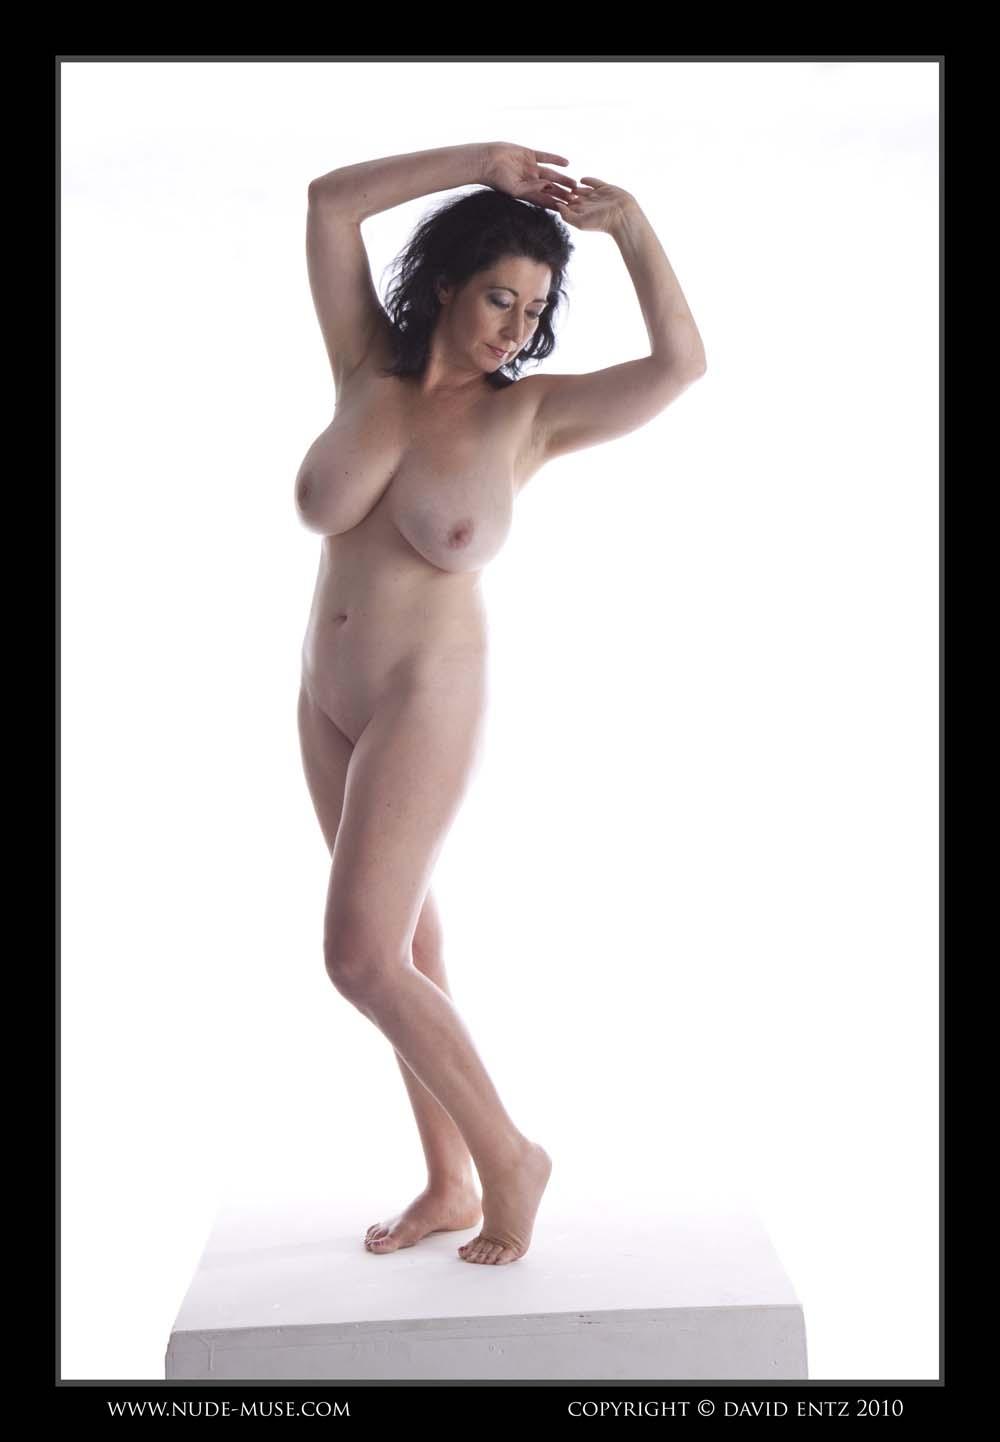 sex neumarkt escort muse